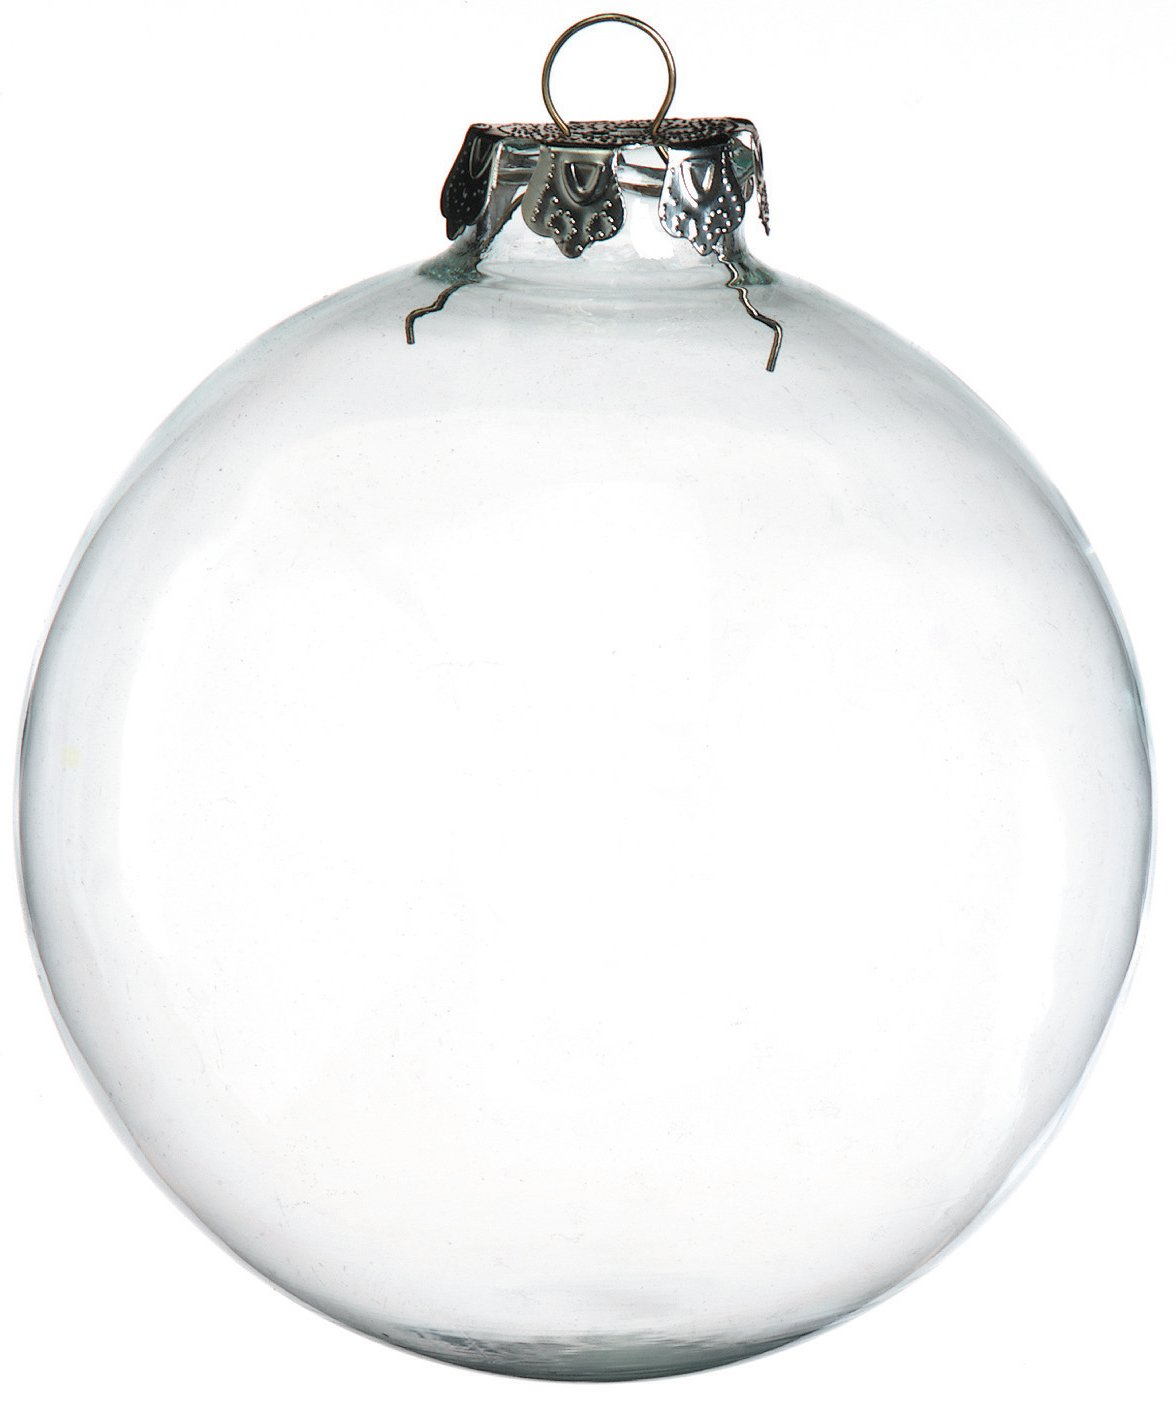 Clear glass ball ornaments - Clear Glass Ball Ornaments 4